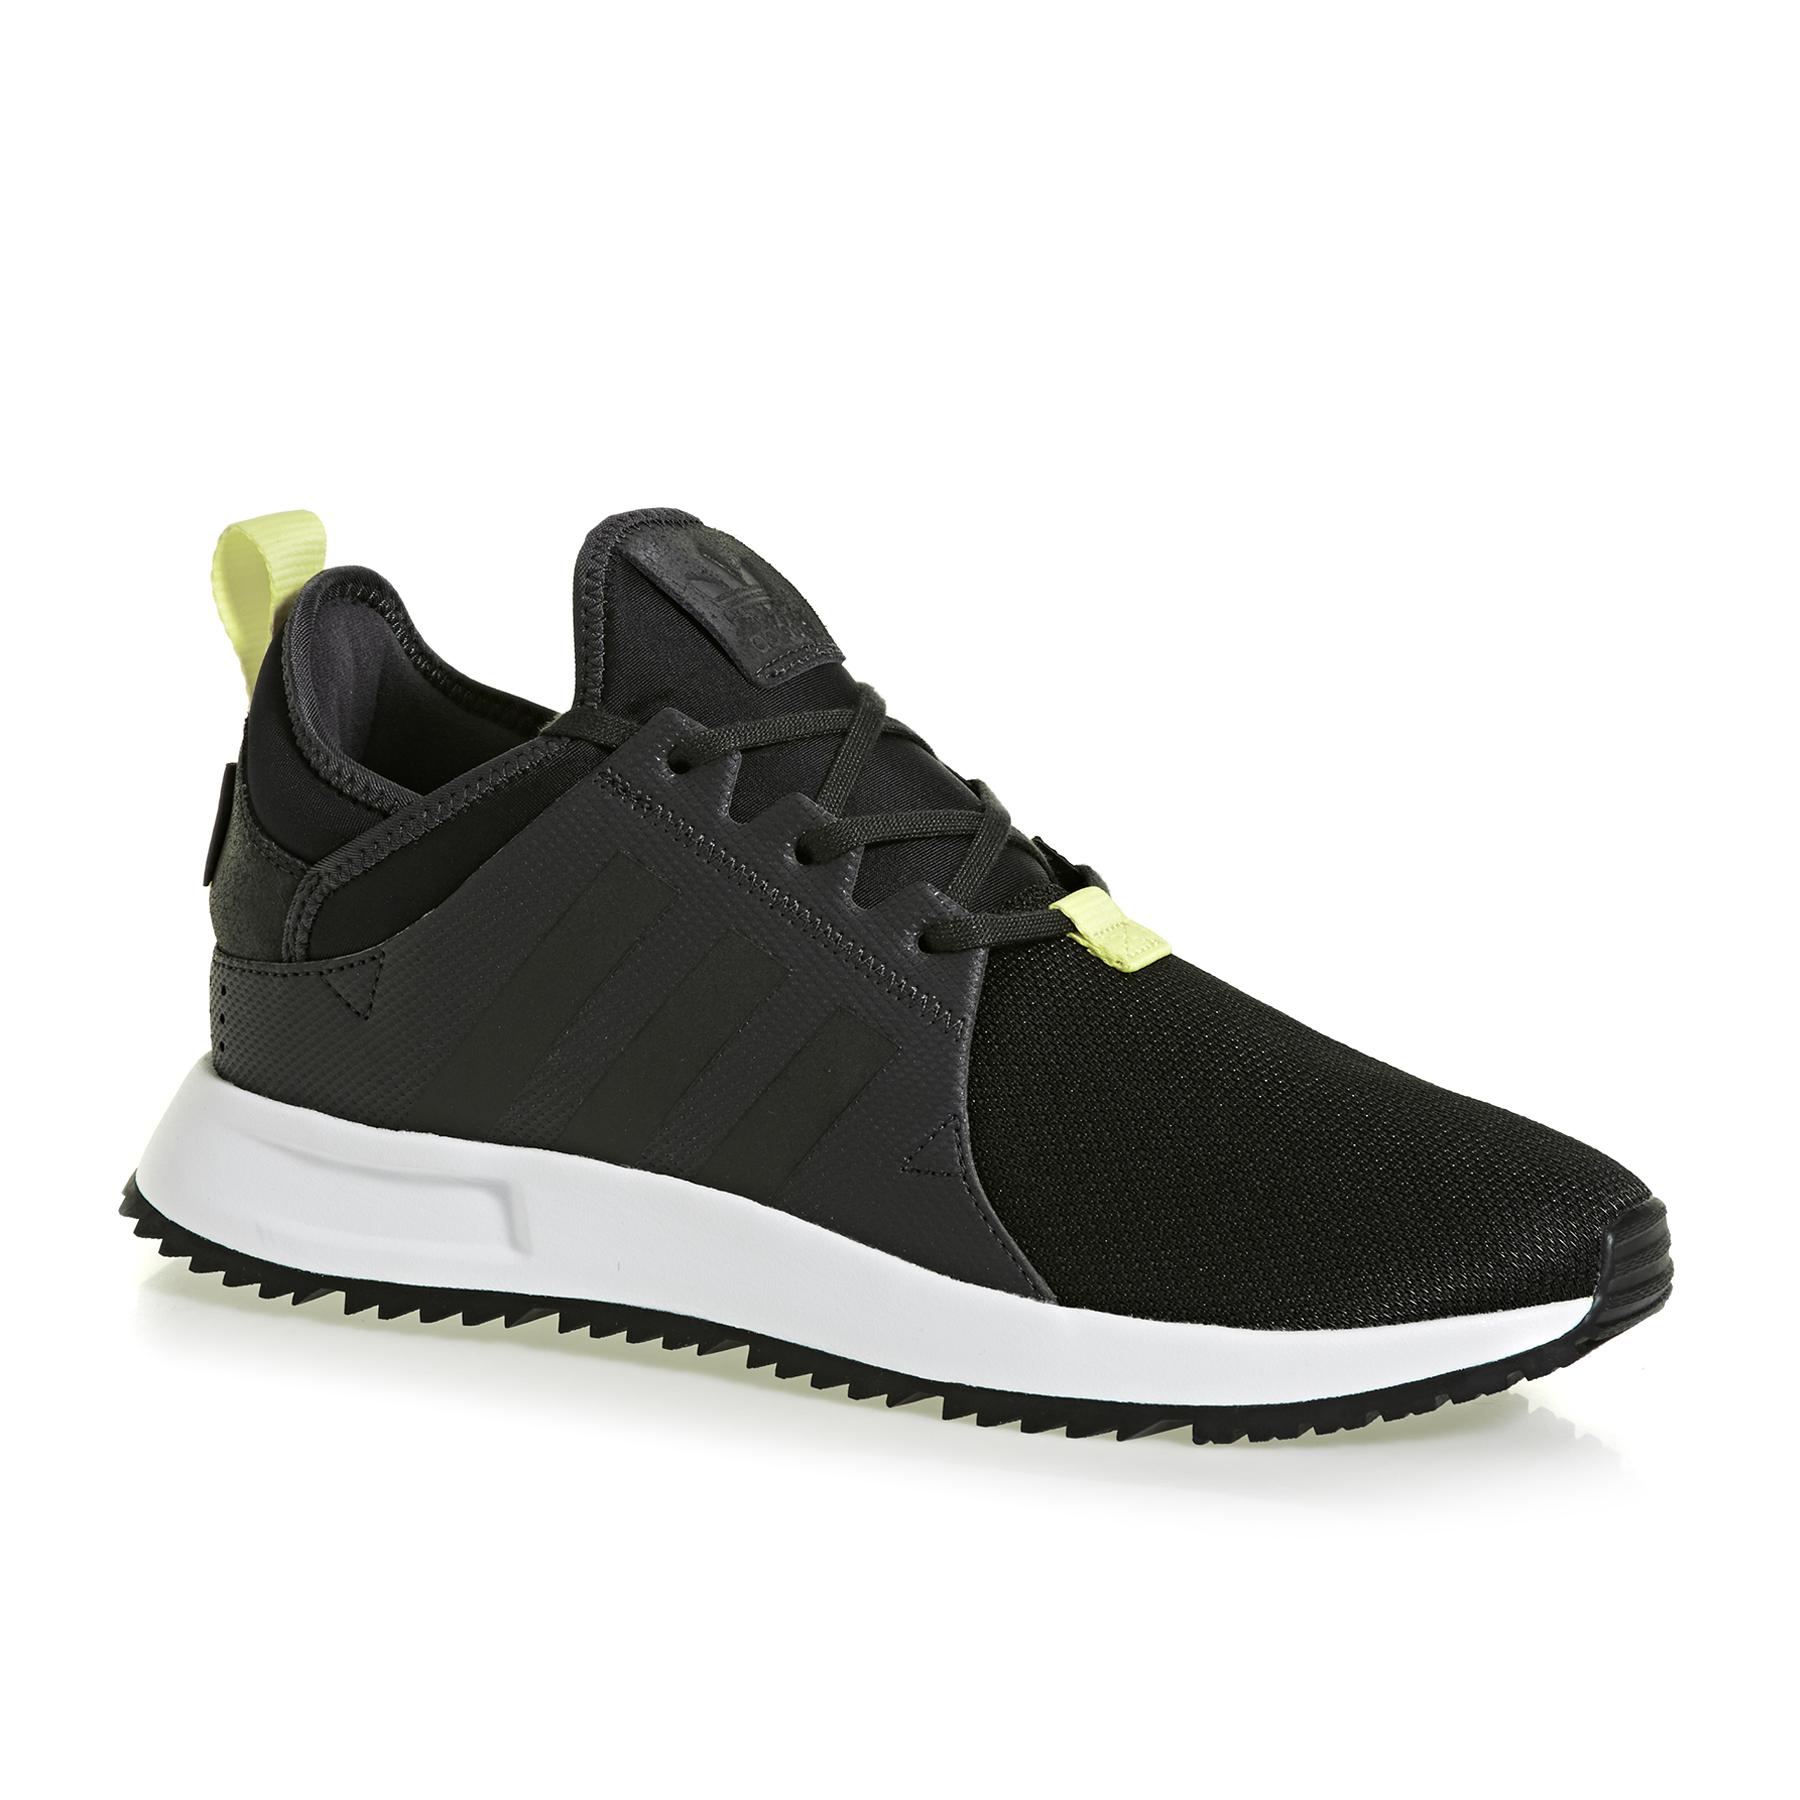 Chaussures Adidas Originals XPLR Sneakerboot | Livraison